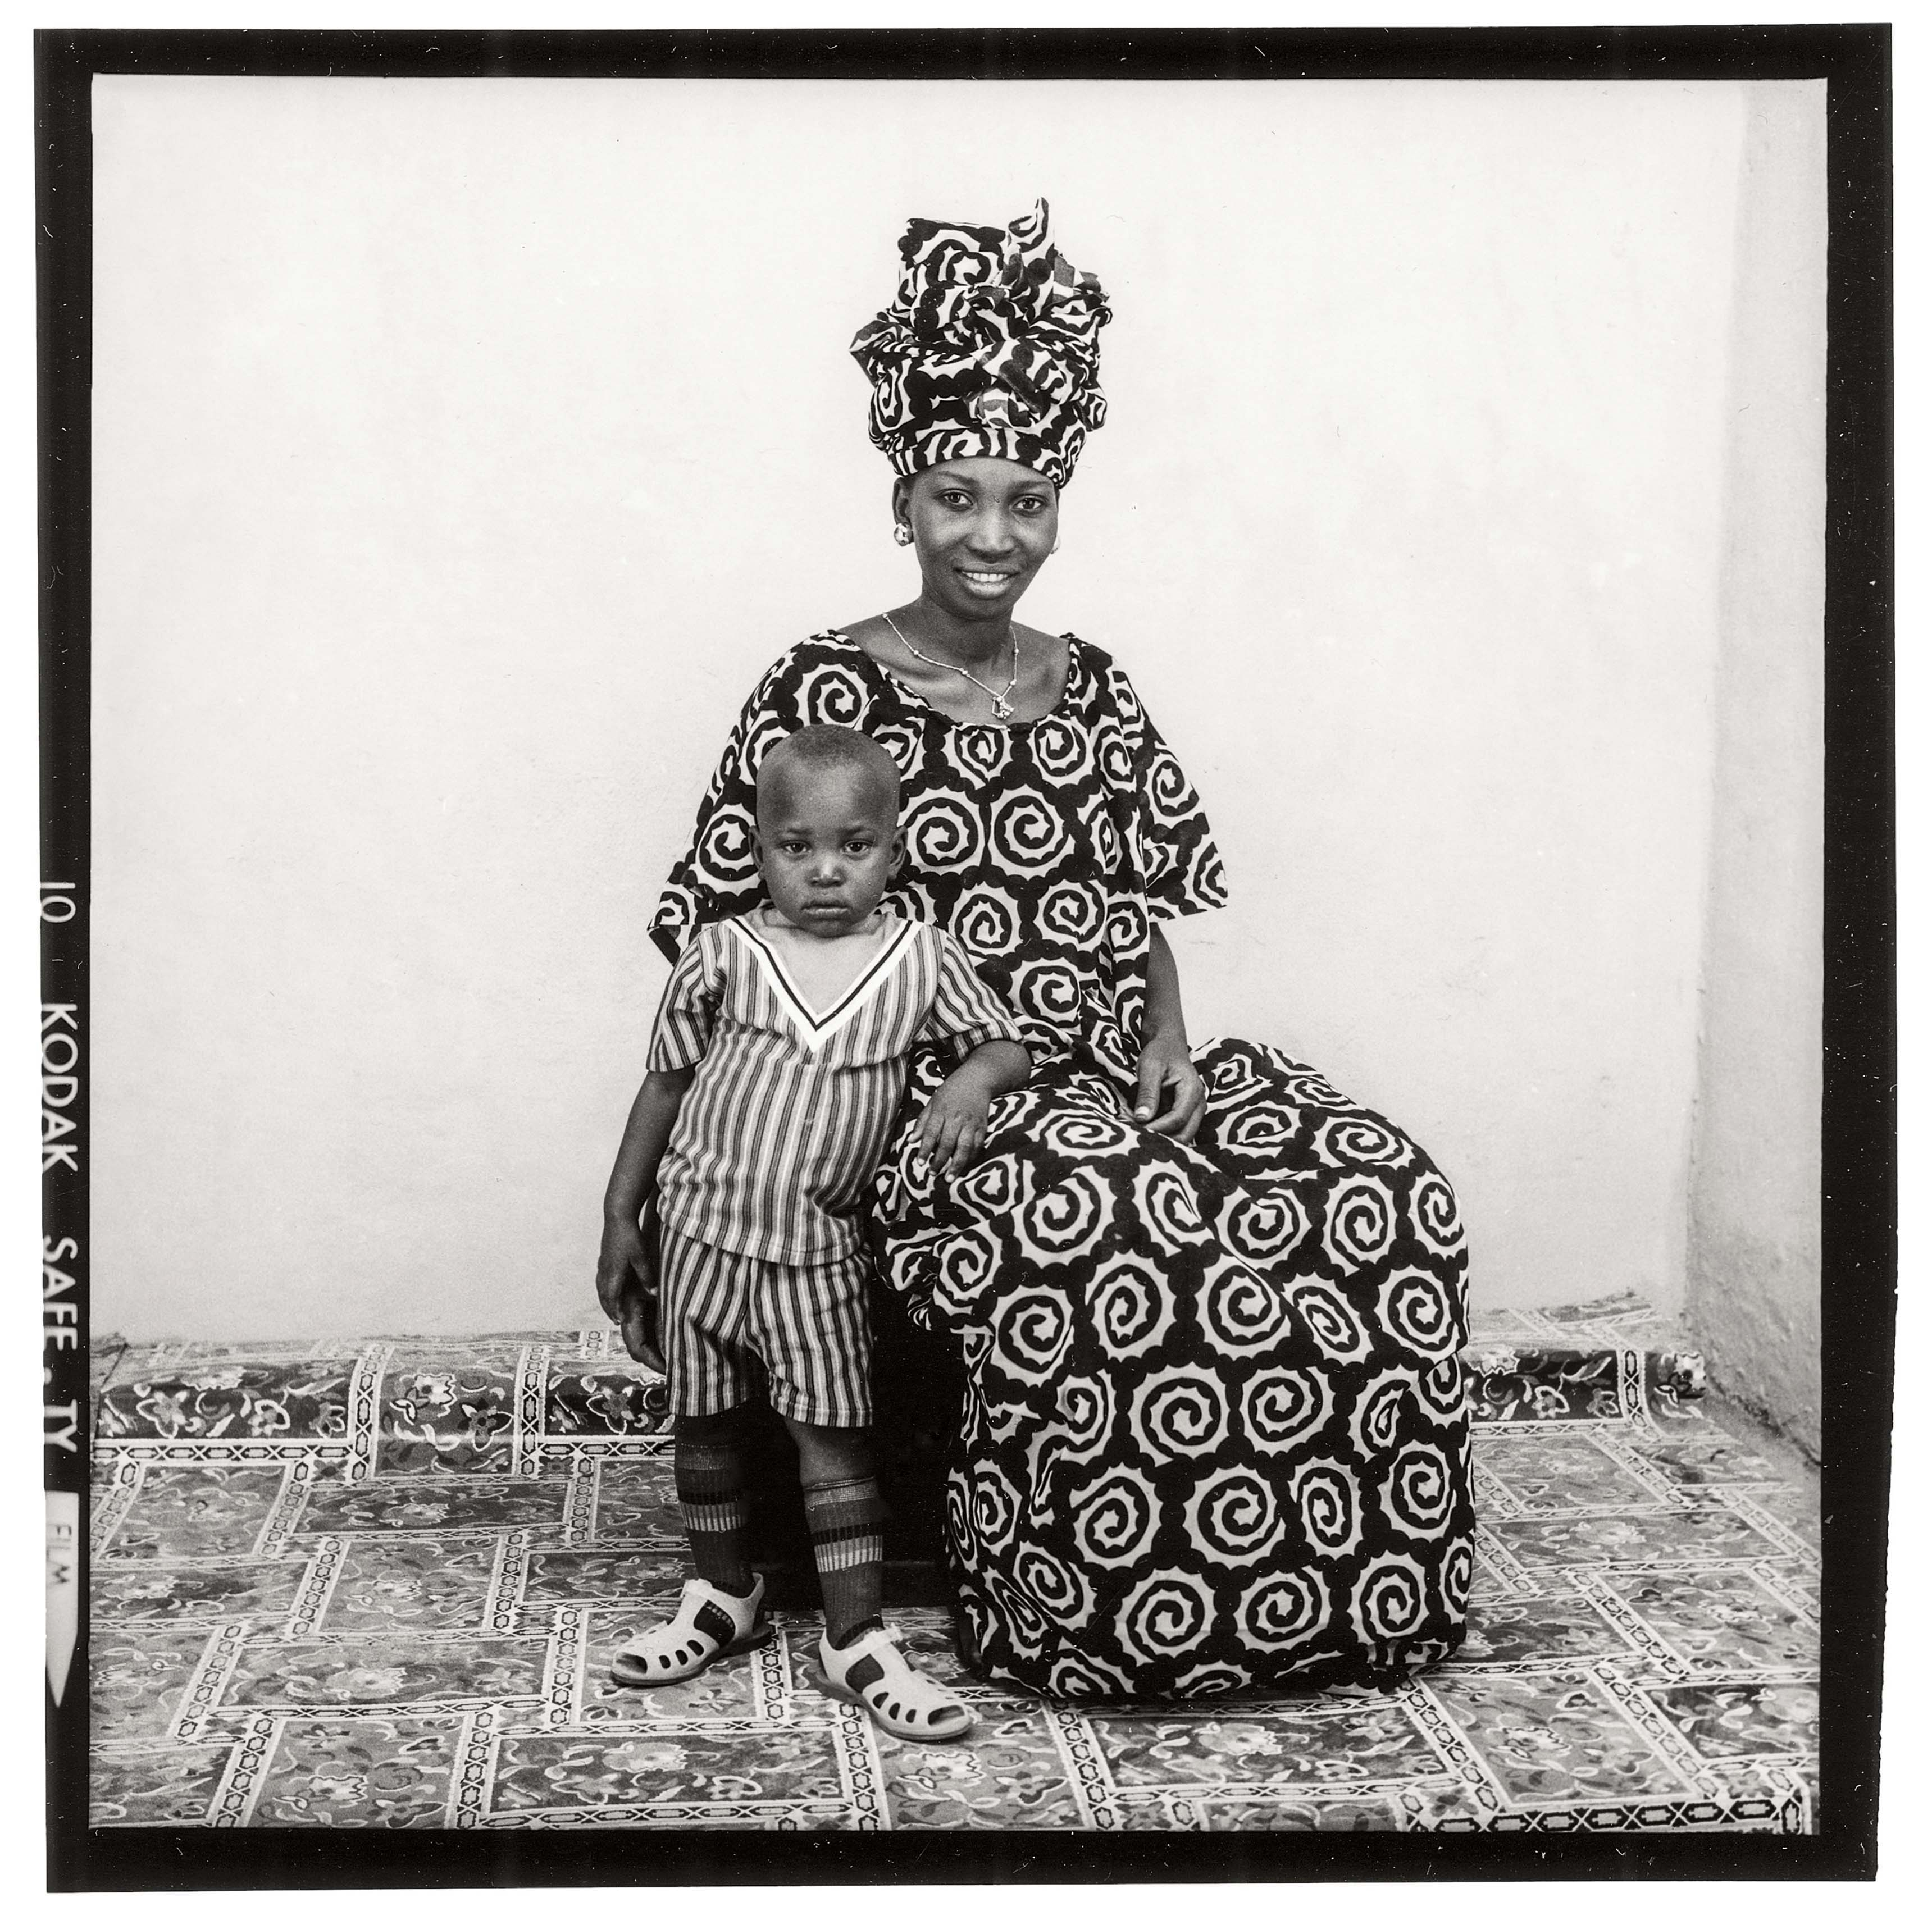 Malick Sidibé, 1973 Tirage gélatino-argentique 50 x 60 cm Courtesy Magnin-A © Malick Sidibé